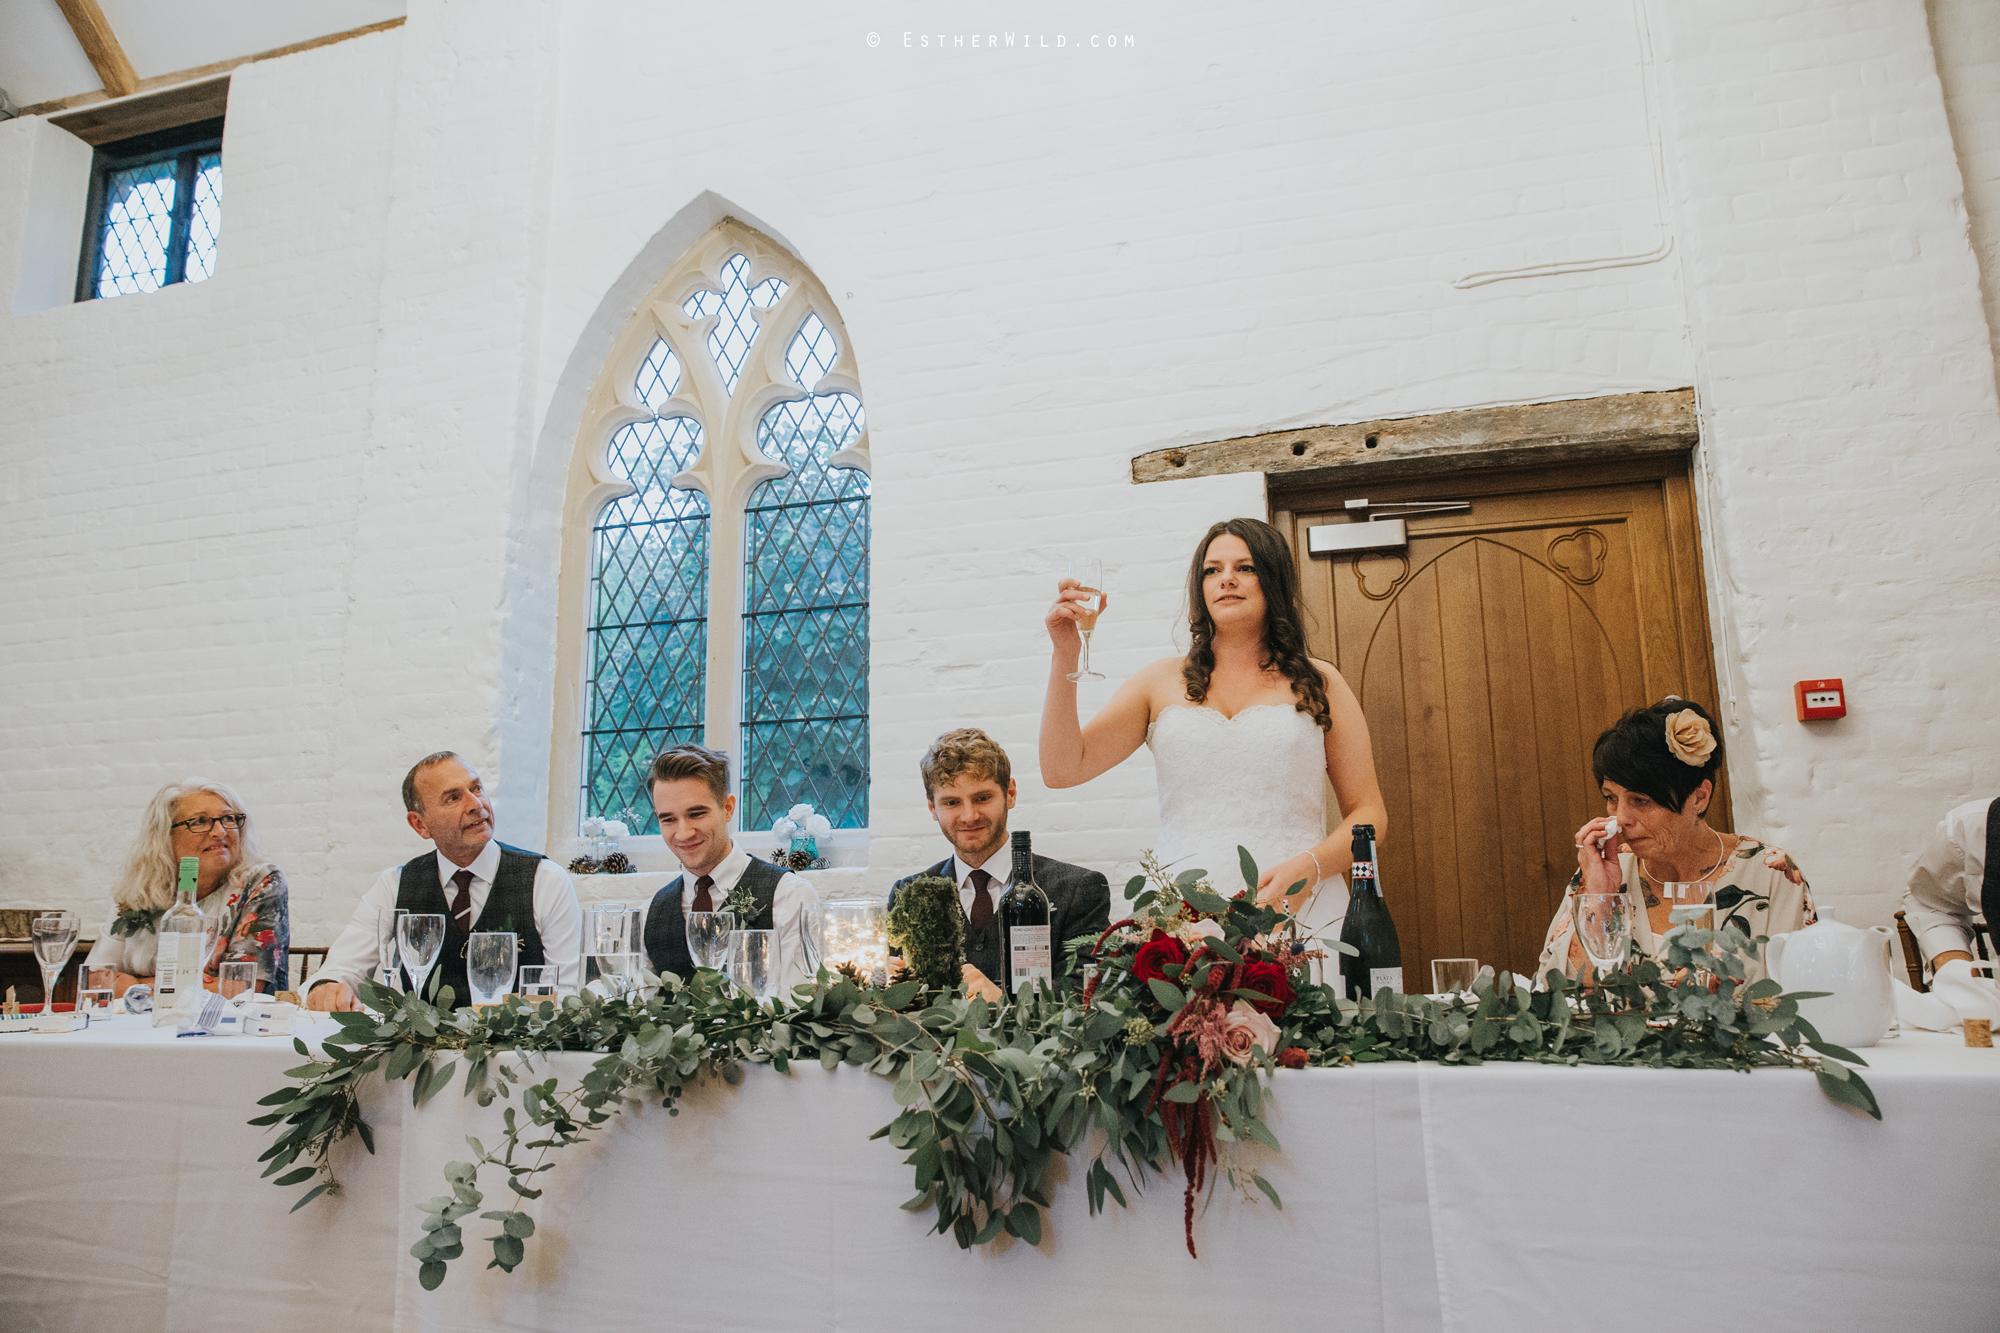 Reading_Room_Weddings_Alby_Norwich_Photographer_Esther_Wild_IMG_2497.jpg